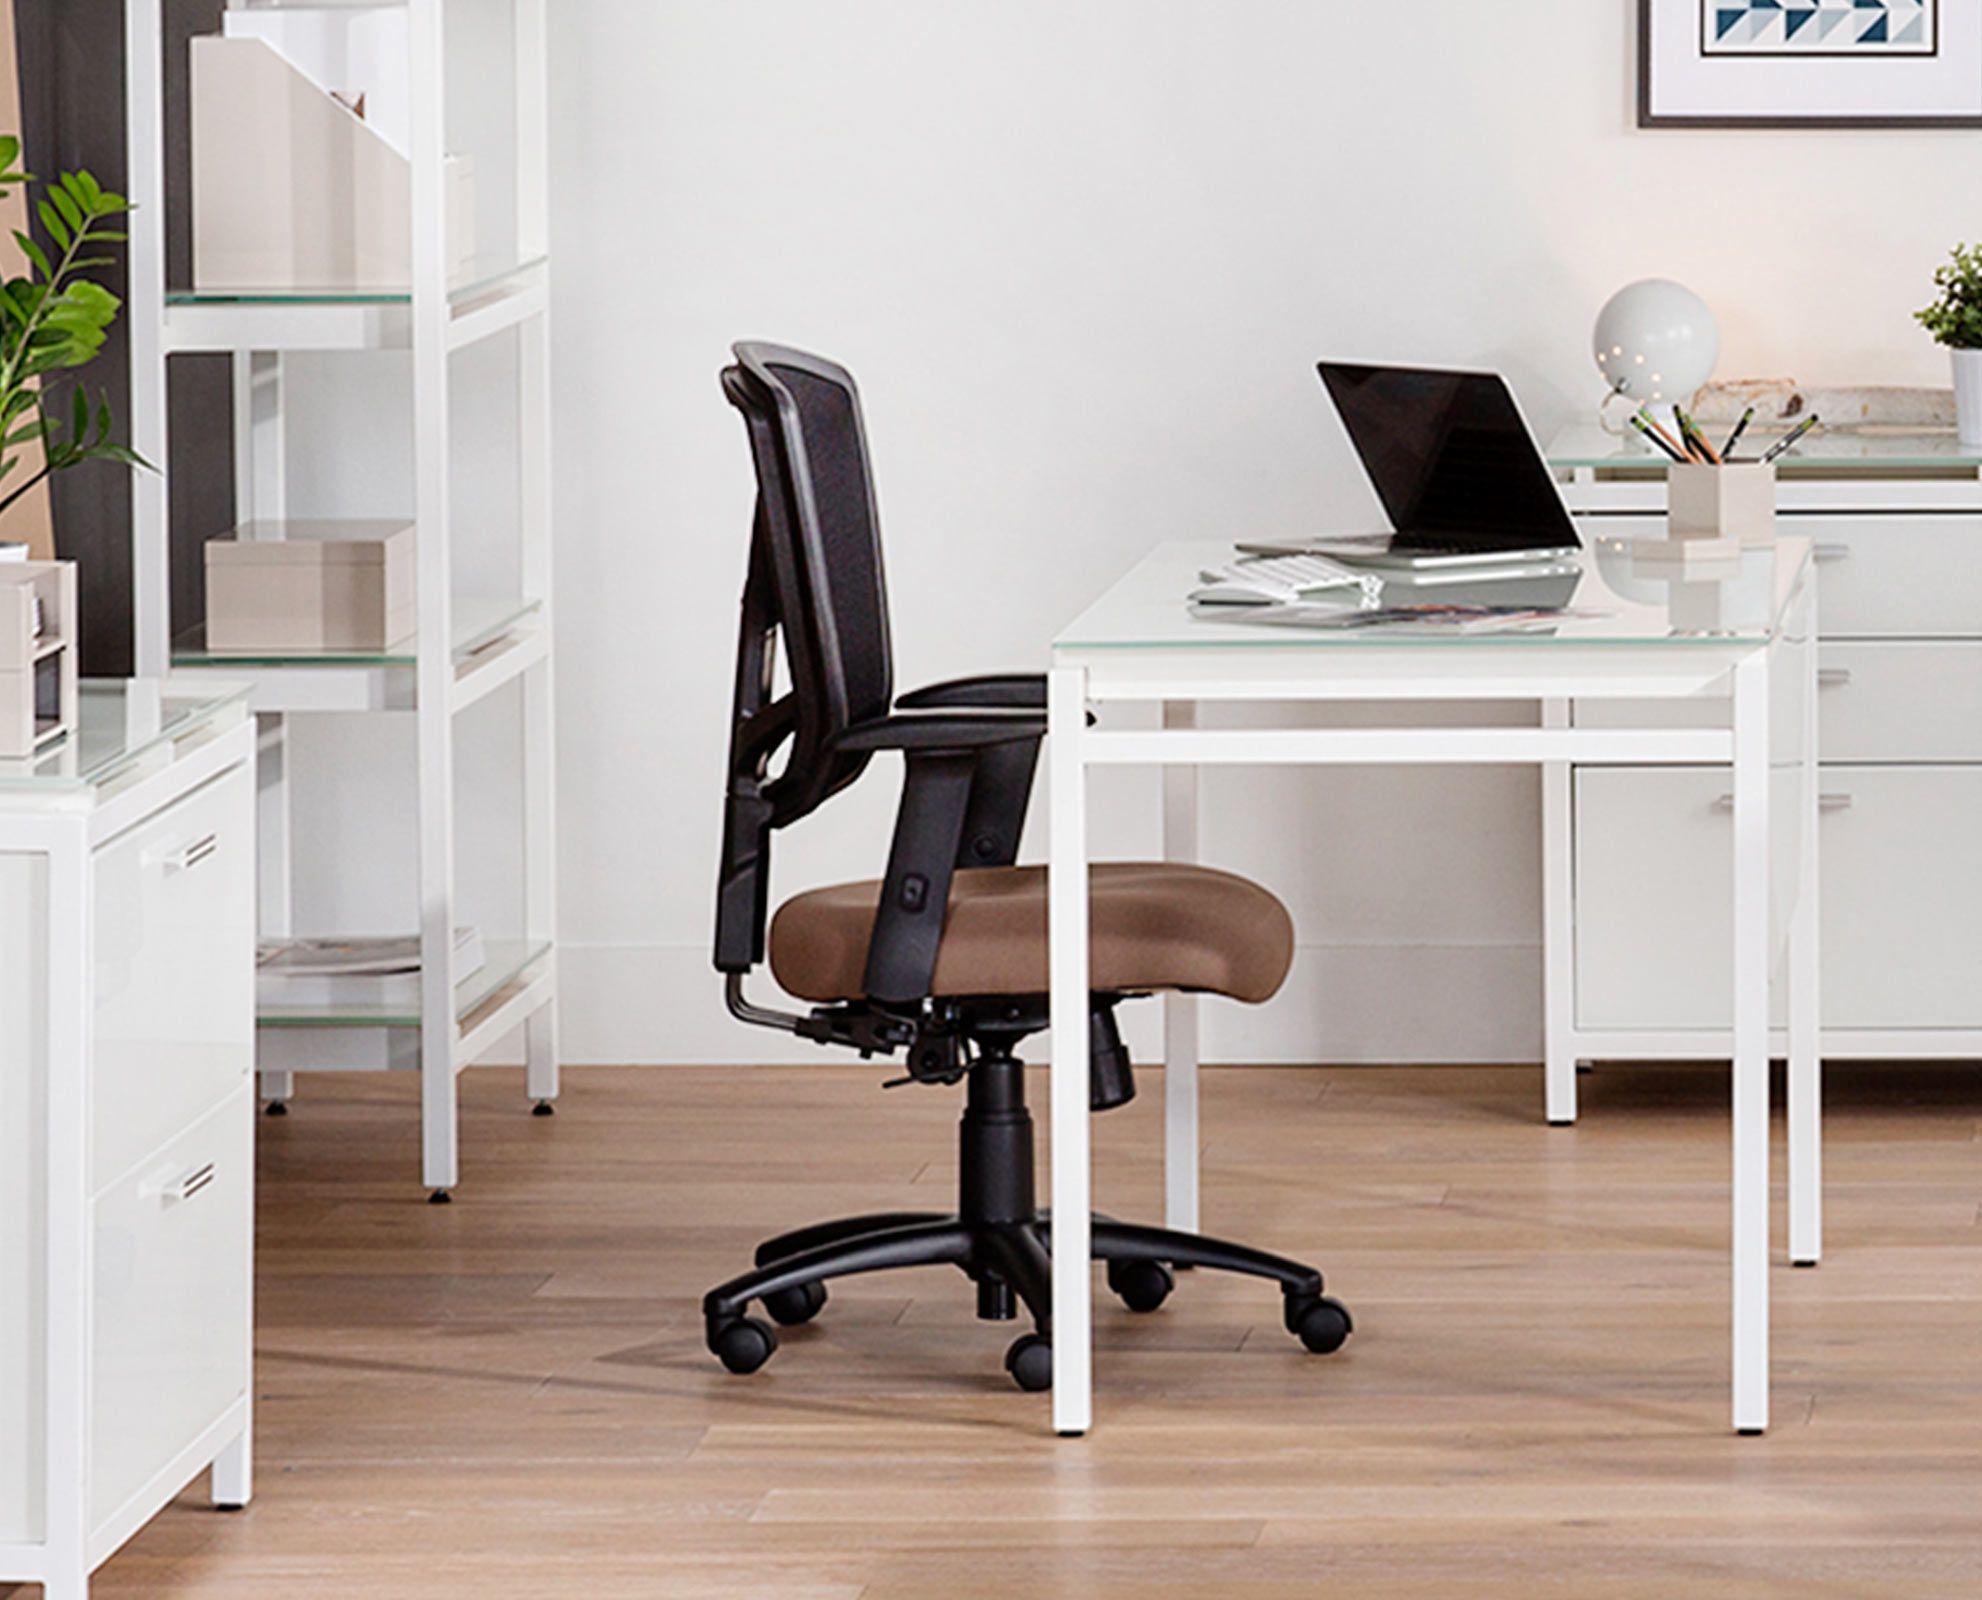 Scandinavian Designs Choose The Nova Small Desk To Brighten And